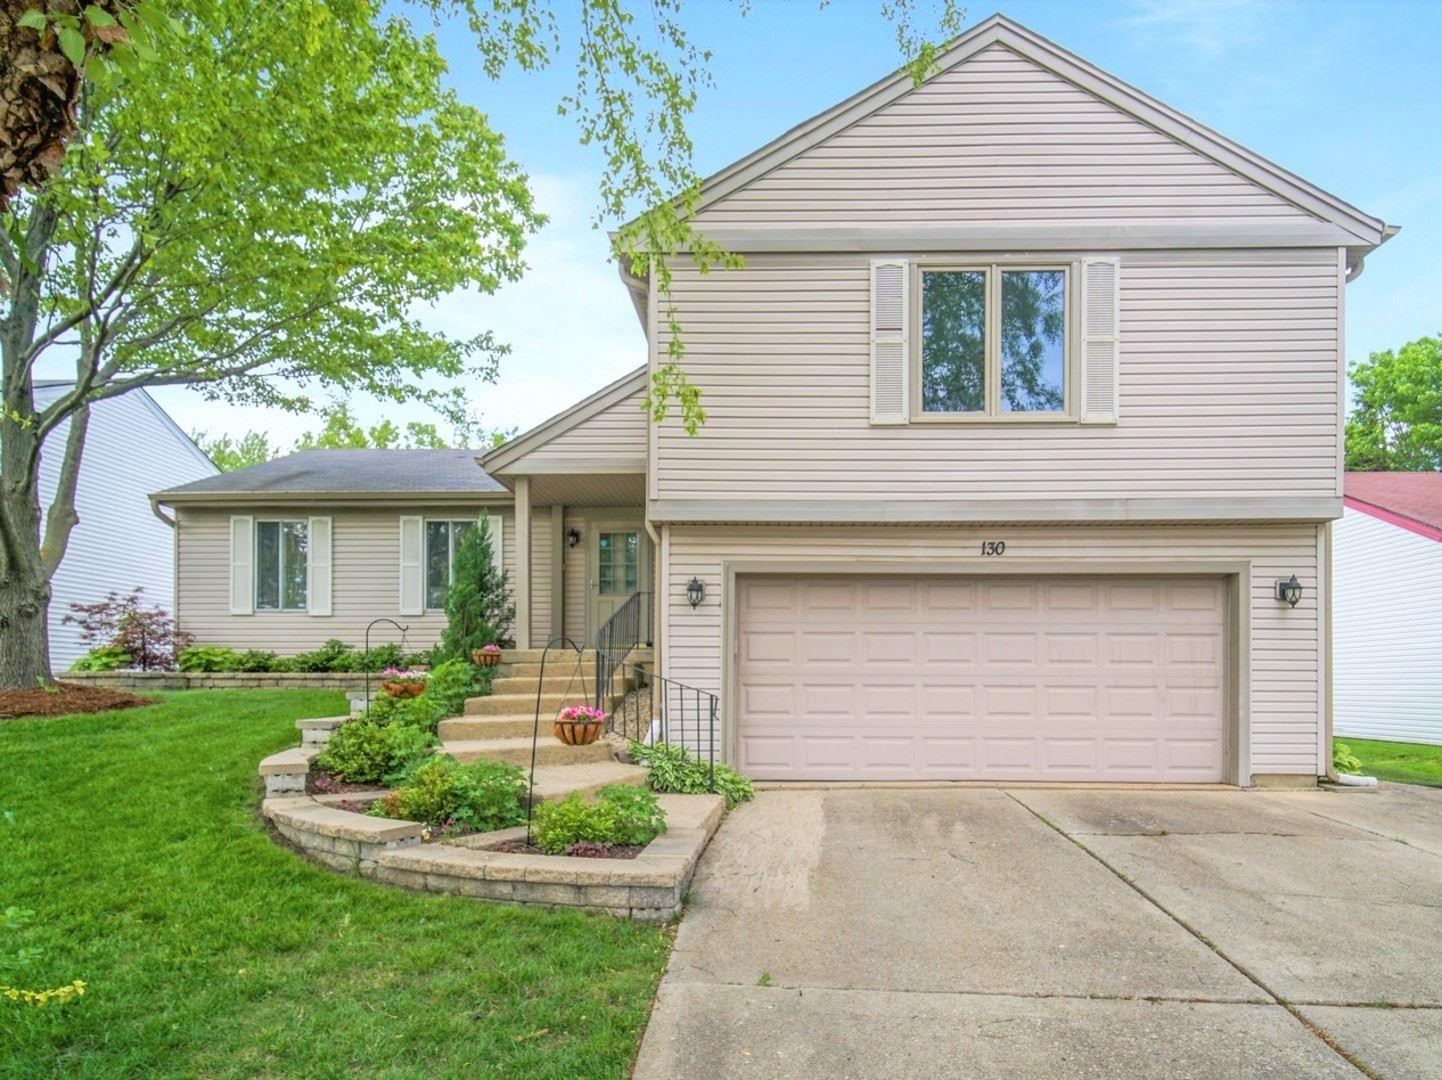 130 Lilac Lane, Buffalo Grove, IL 60089 - #: 10719860